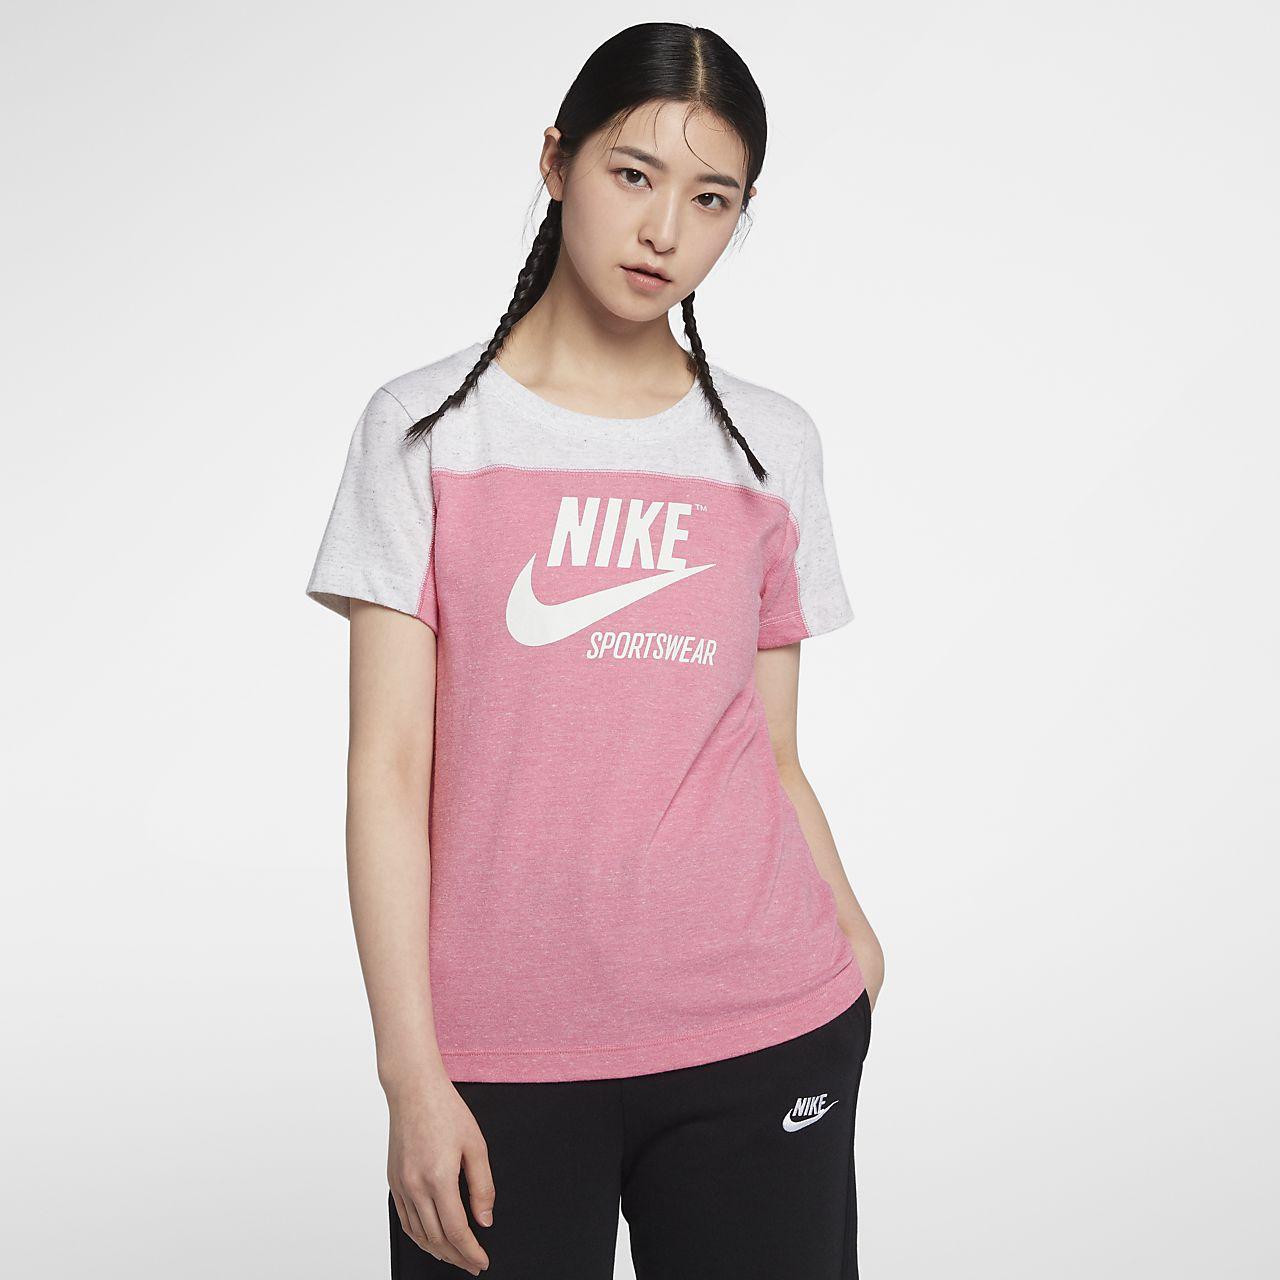 Nike Sportswear Vintage 女子短袖上衣